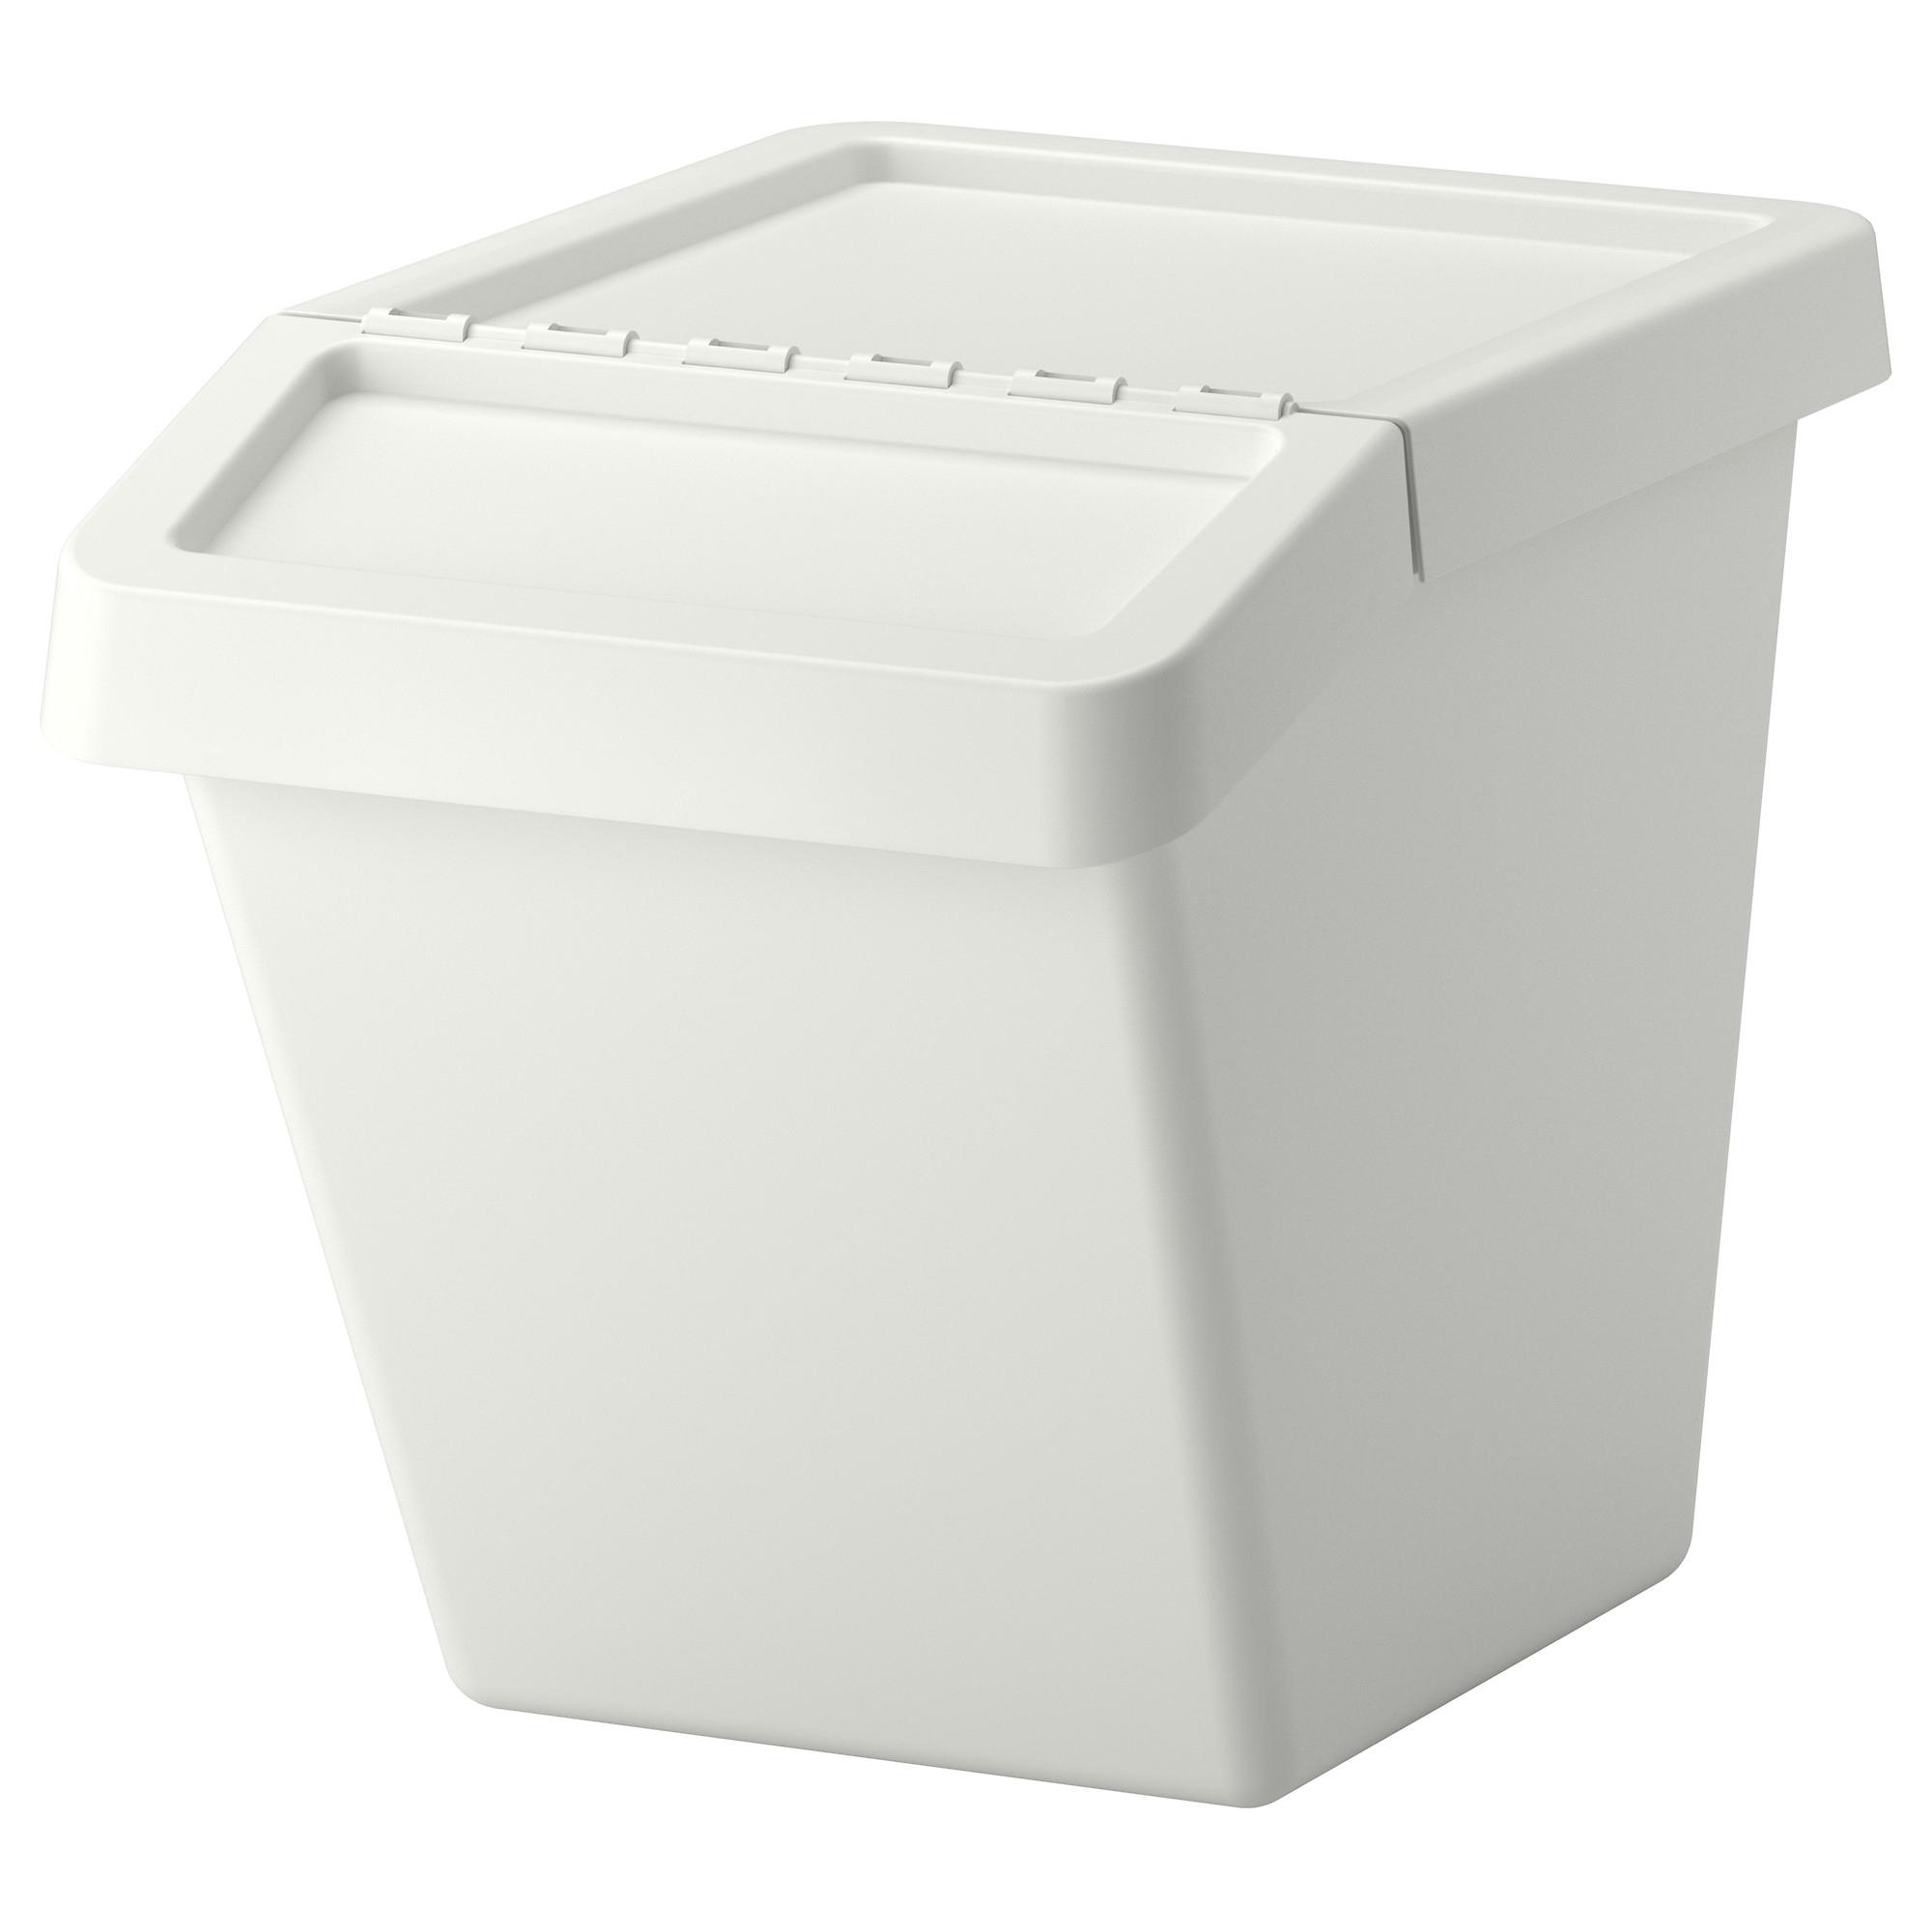 Sortera cubo de reciclaje con tapa - Ikea cubo ropa ...